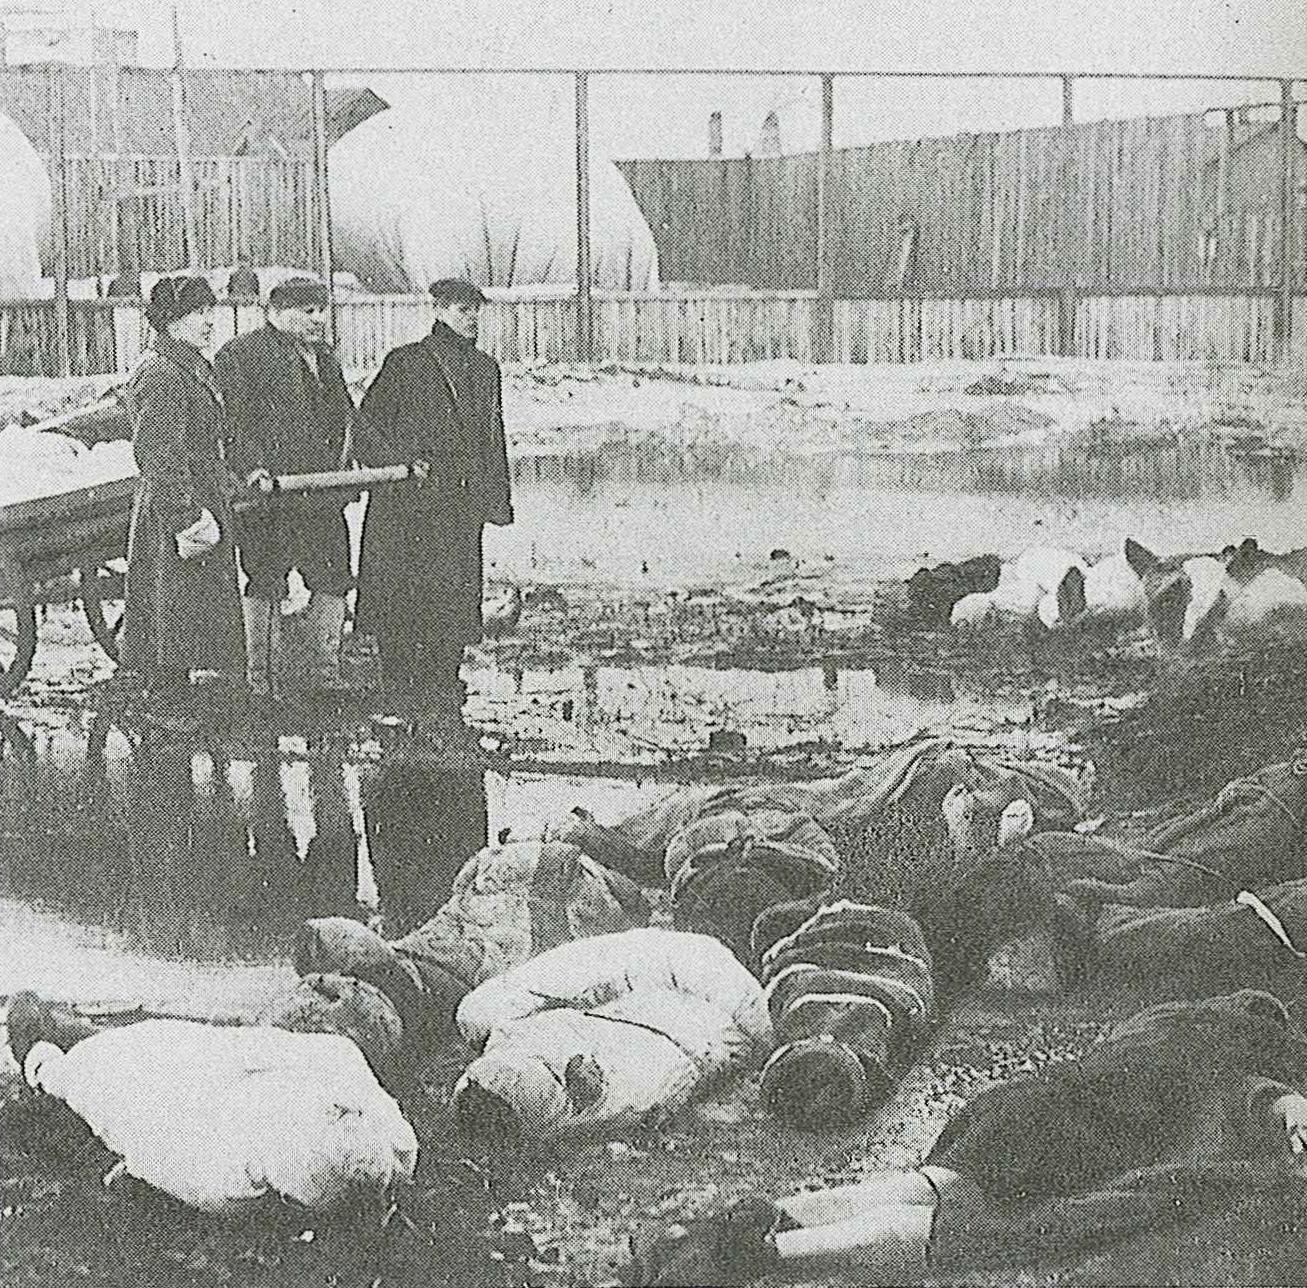 Japan No War (JNW) 日本平和の市民連盟 : ドイツ軍の包囲でレニングラード市民等の死者は約120萬人にも達し約67 ...